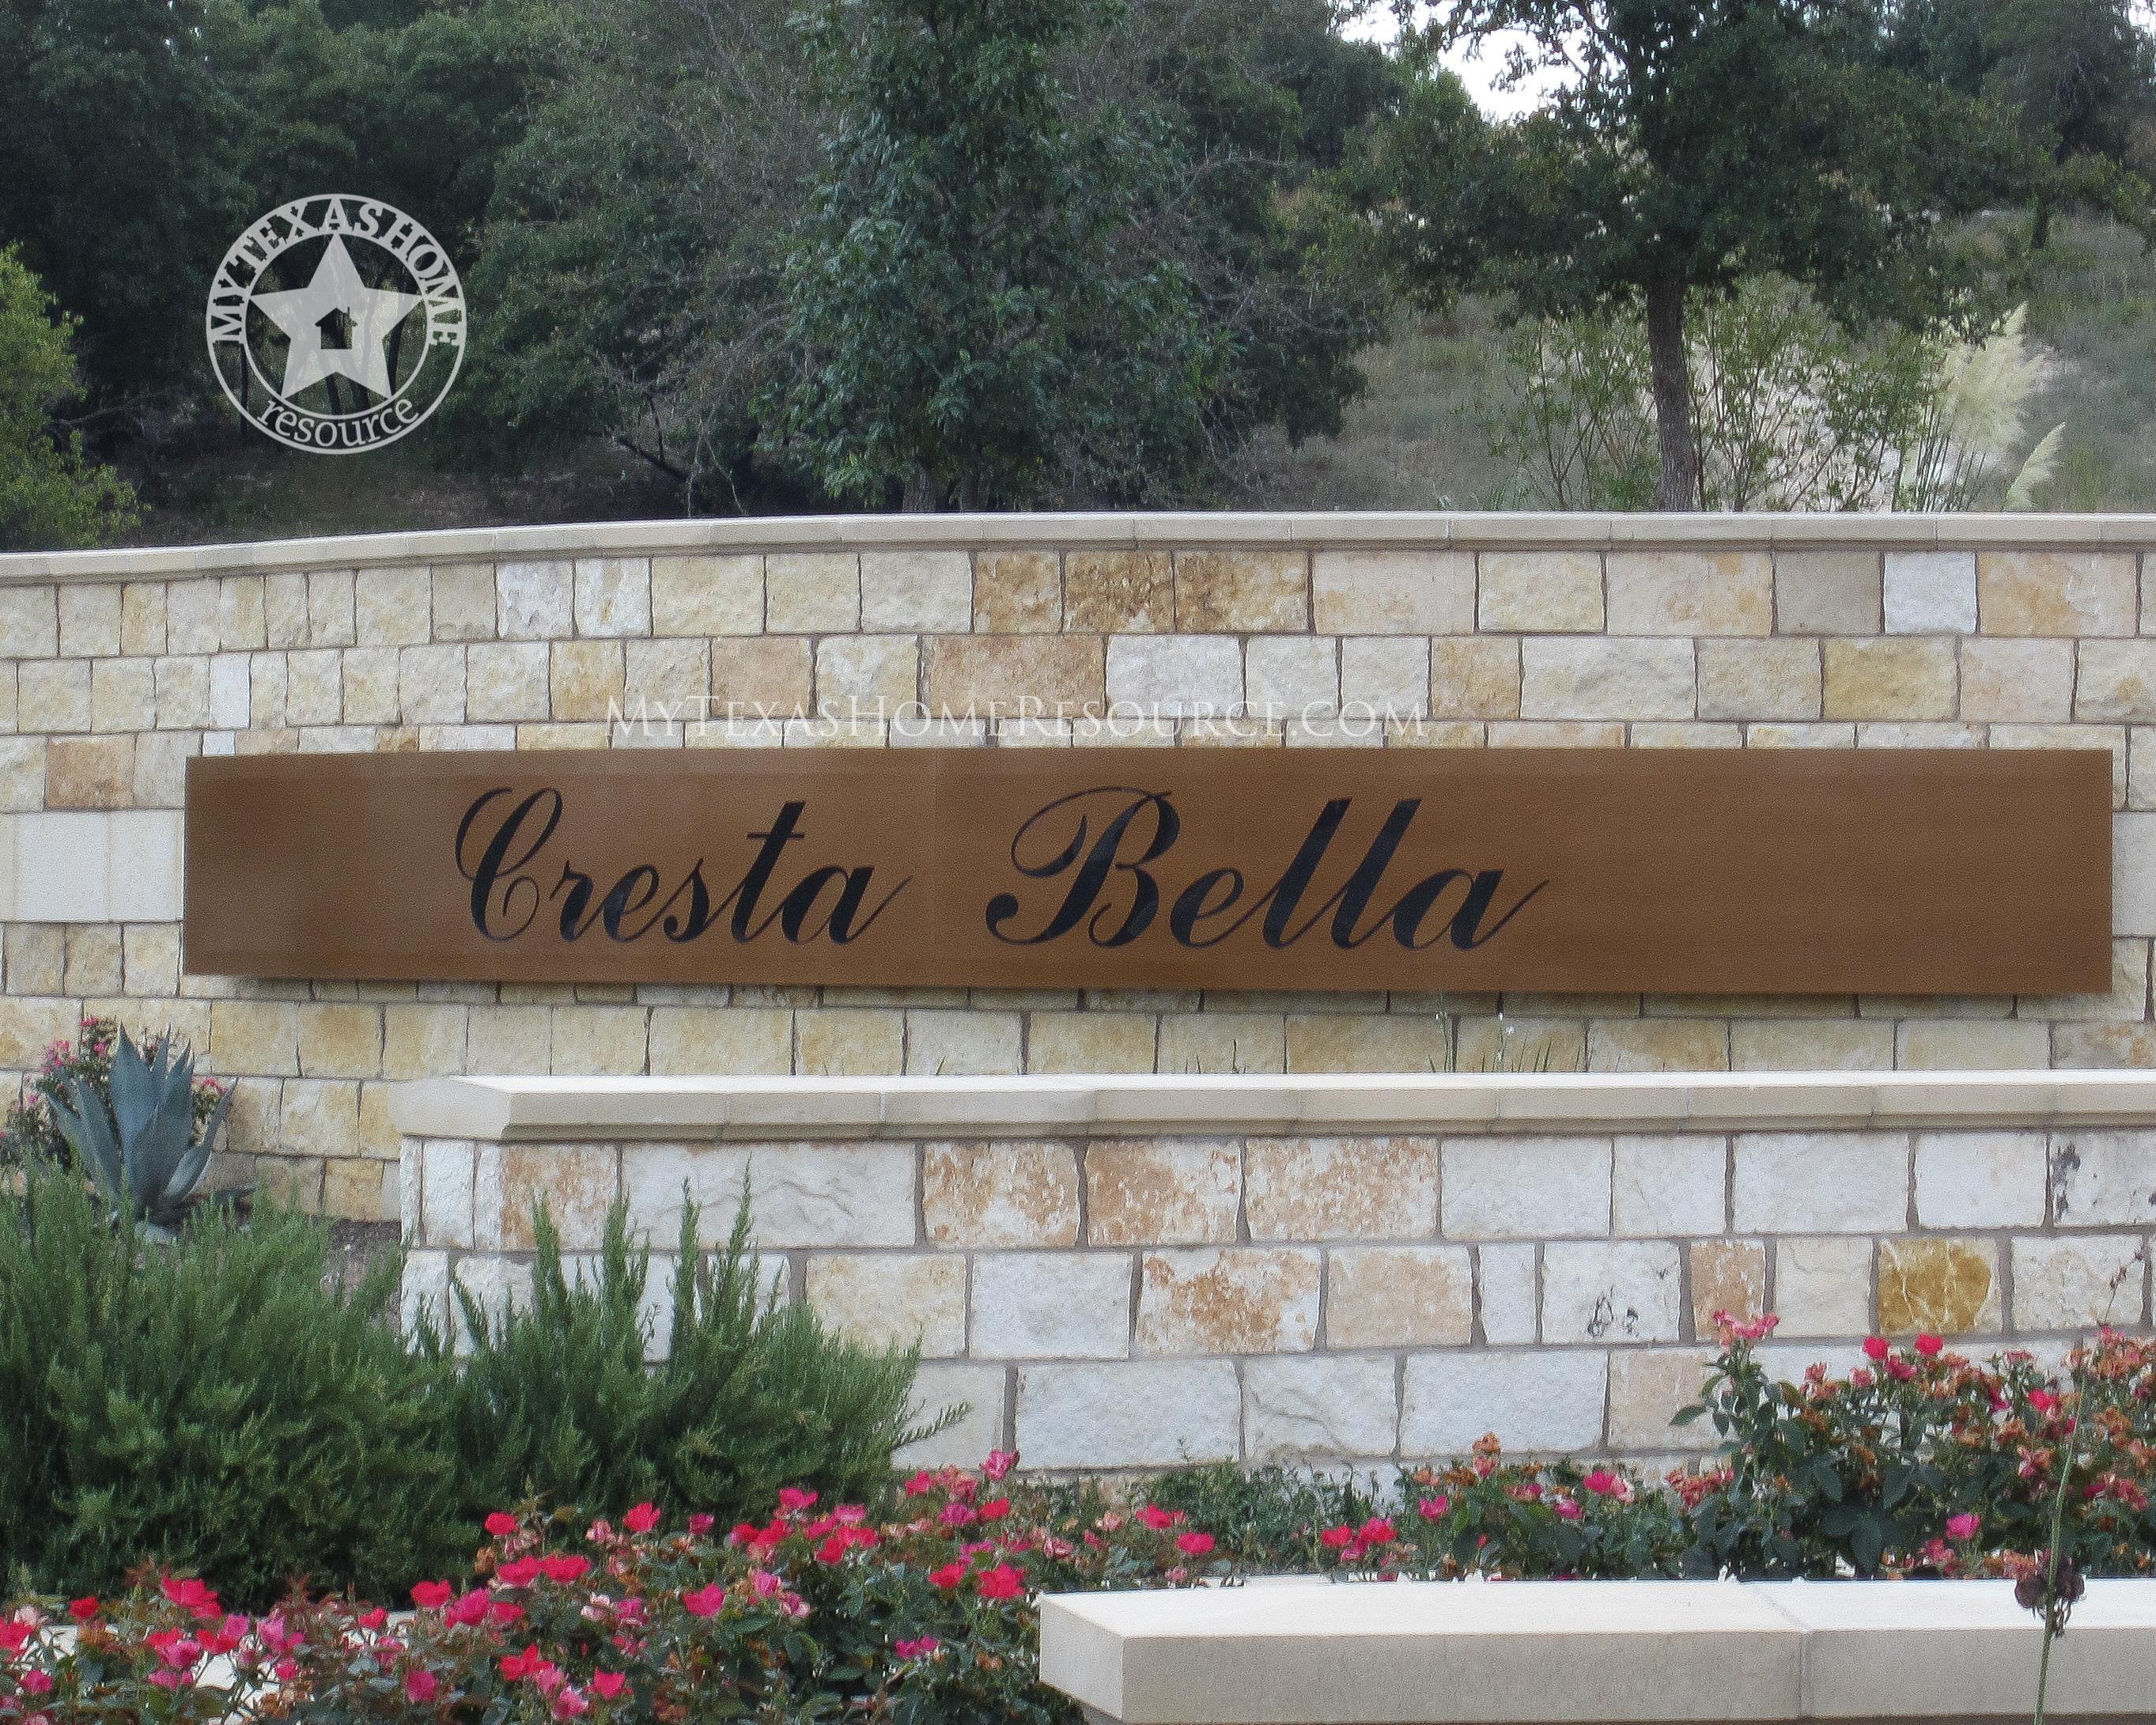 Cresta Bella Community